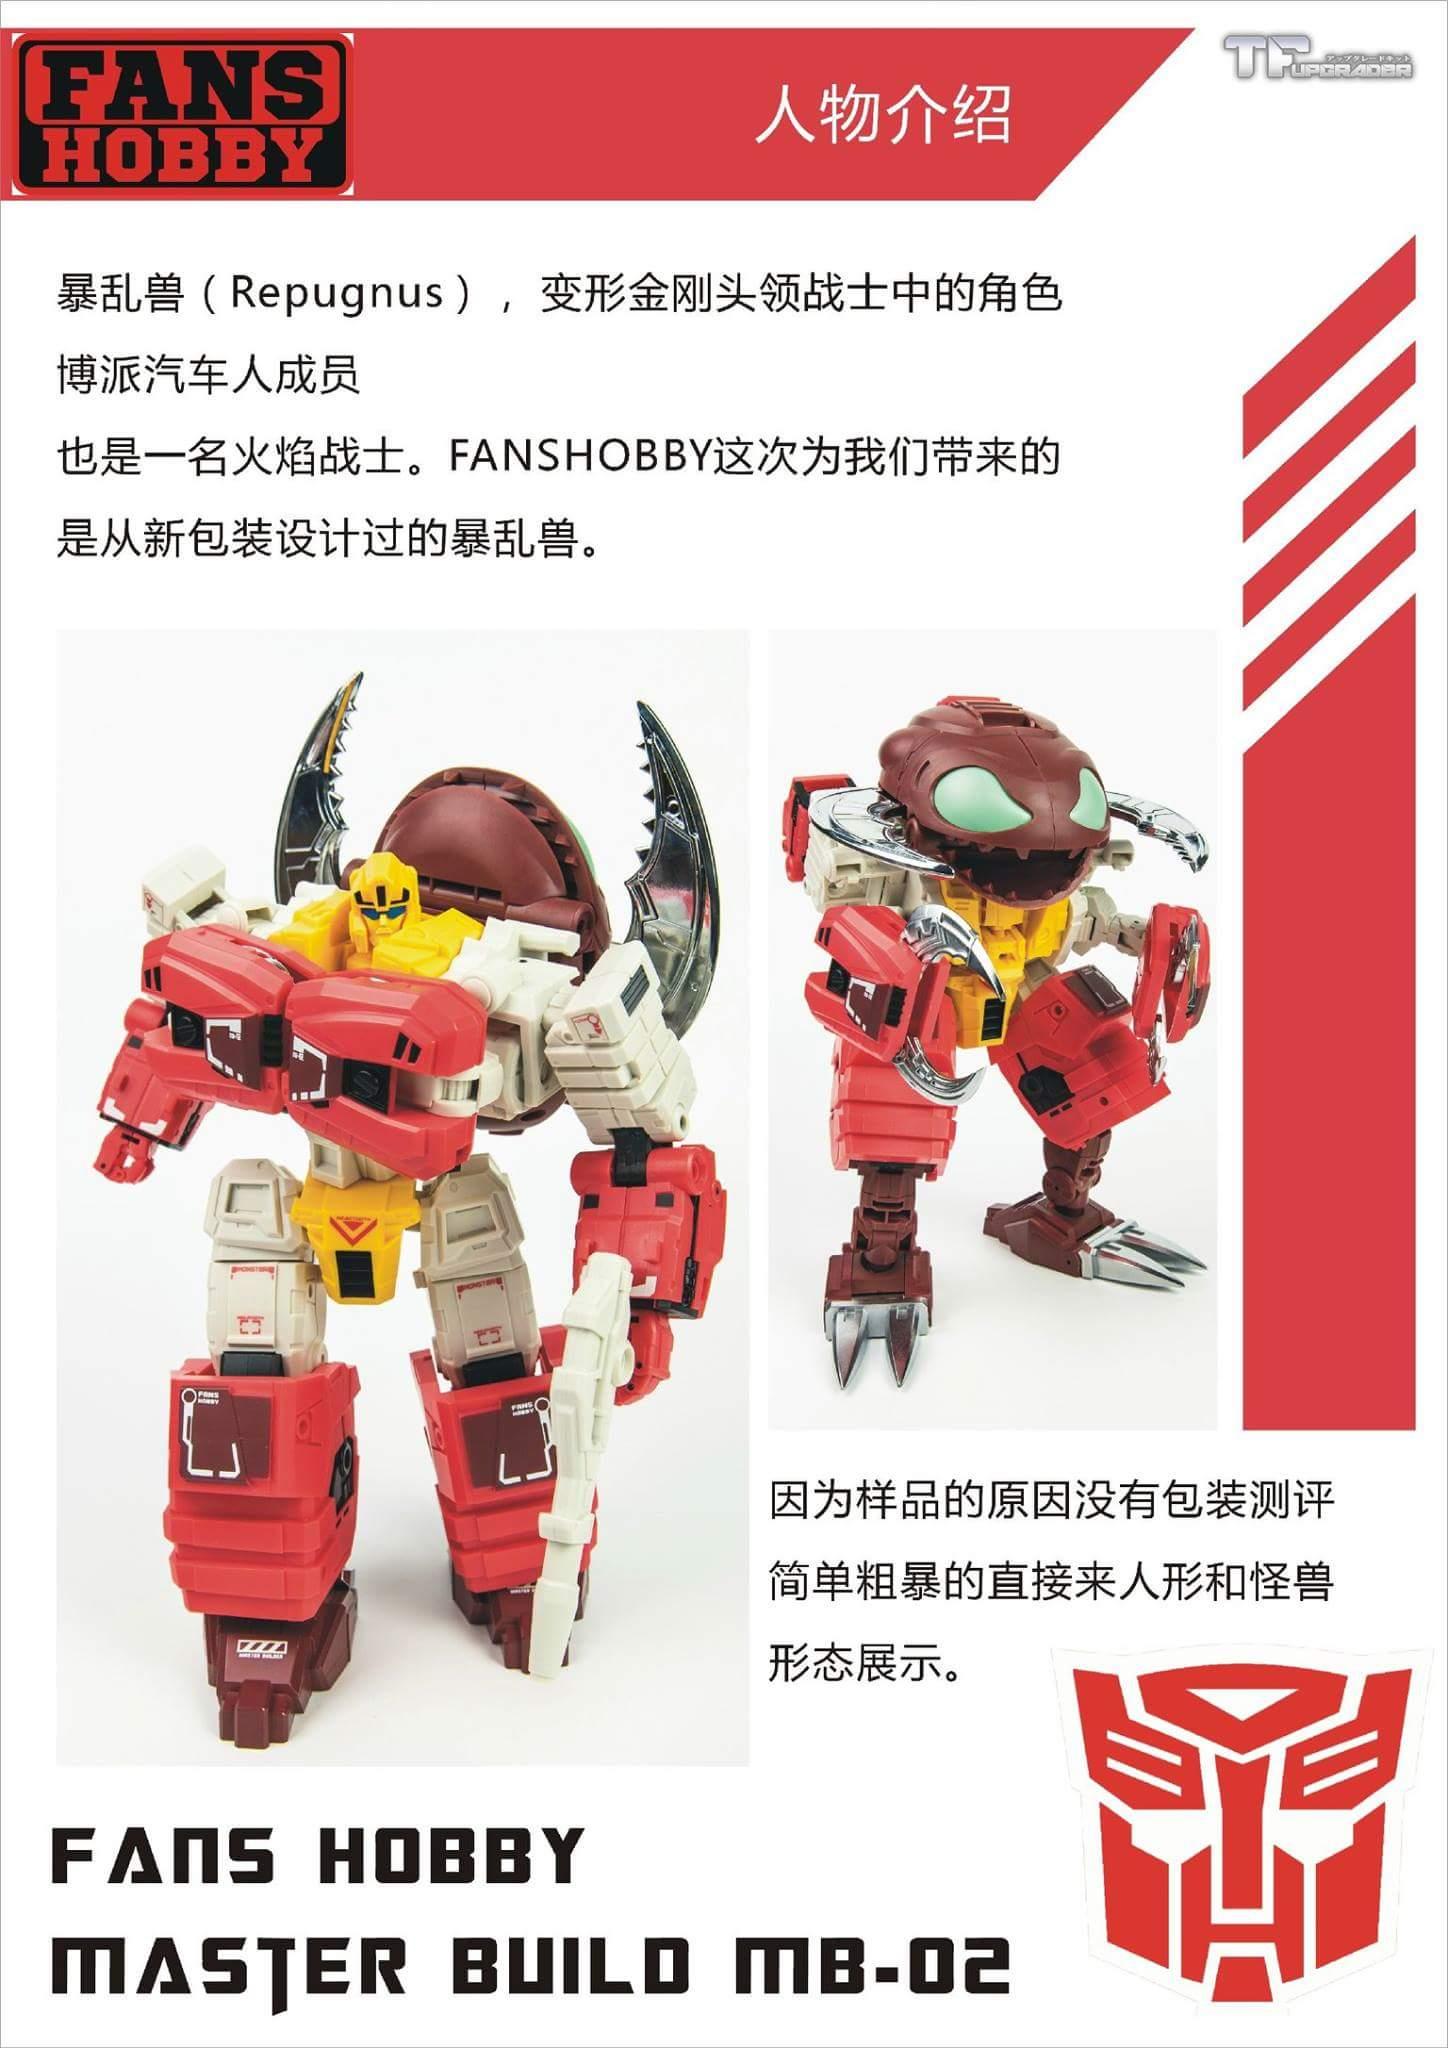 [FansHobby] Produit Tiers - Master Builder MB-02/03/05 - aka Monsterbots/Monstrebots UKIexZsY